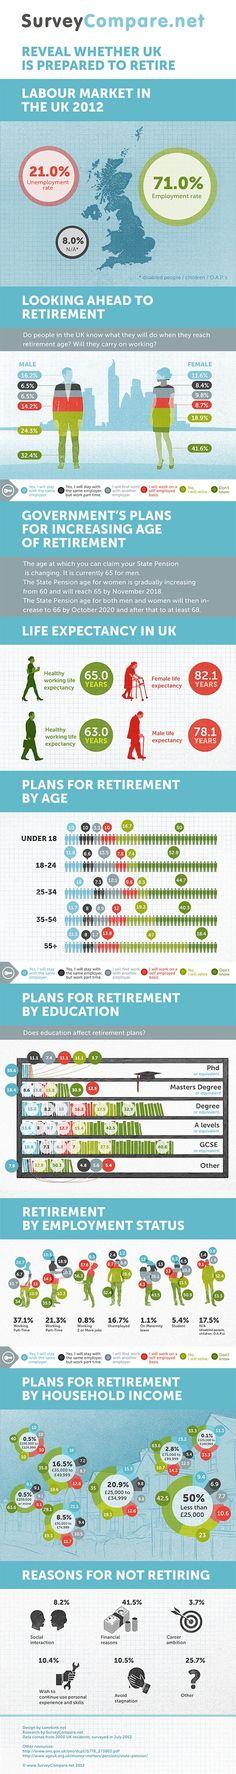 Work from Home Wisdom retirement infographic via @Judith de Munck Heminsley